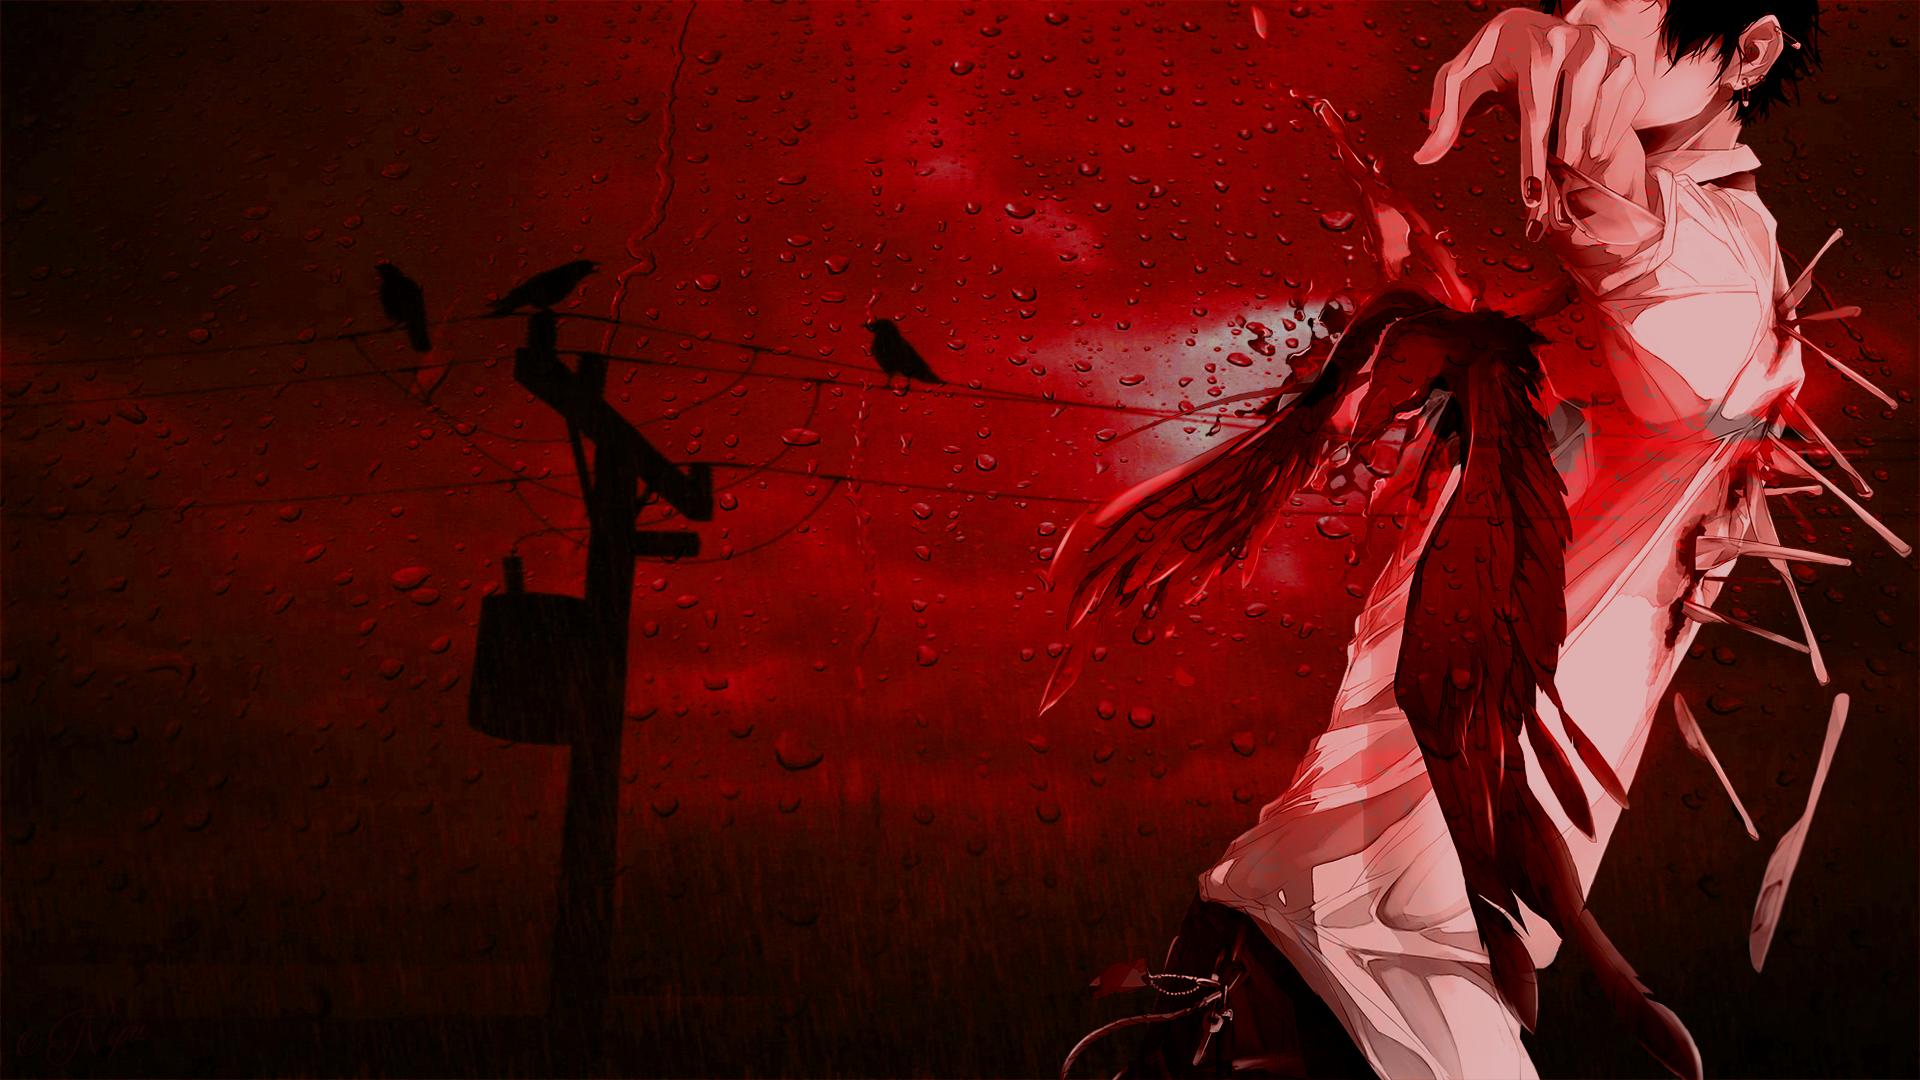 Anime Boy Crow Wallpaper by Nyanashii on DeviantArt